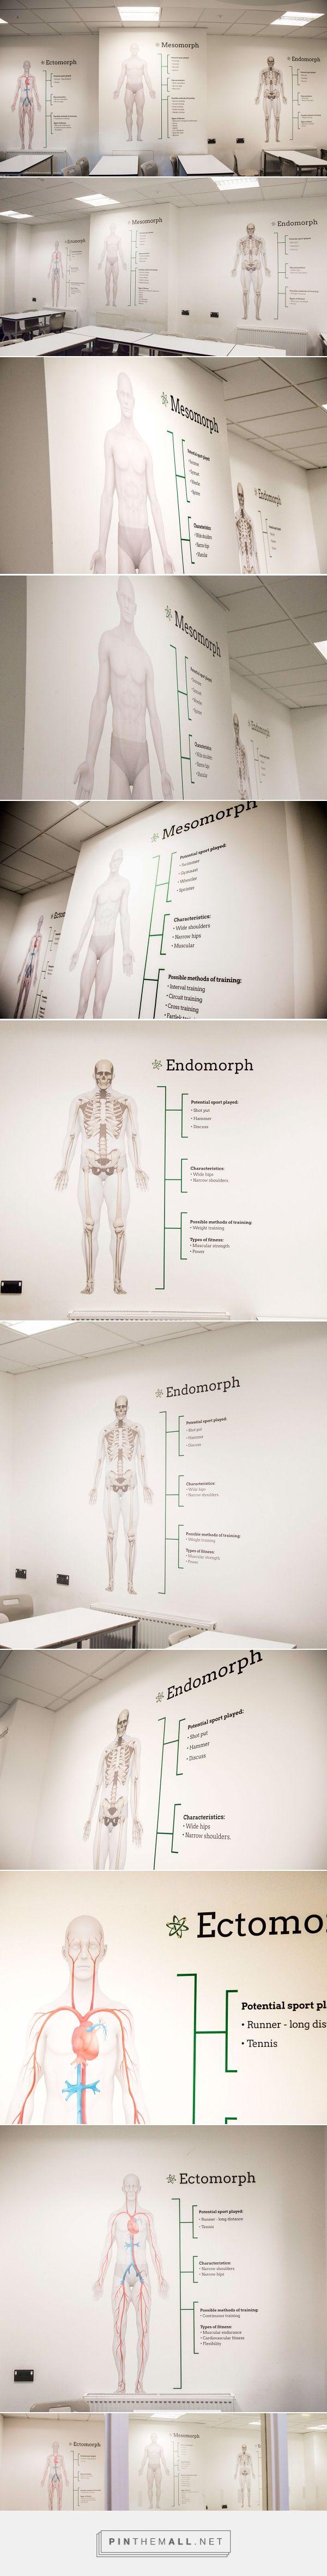 Somatotypes (PE Classroom design) on Behance - By Andrew Heffernan